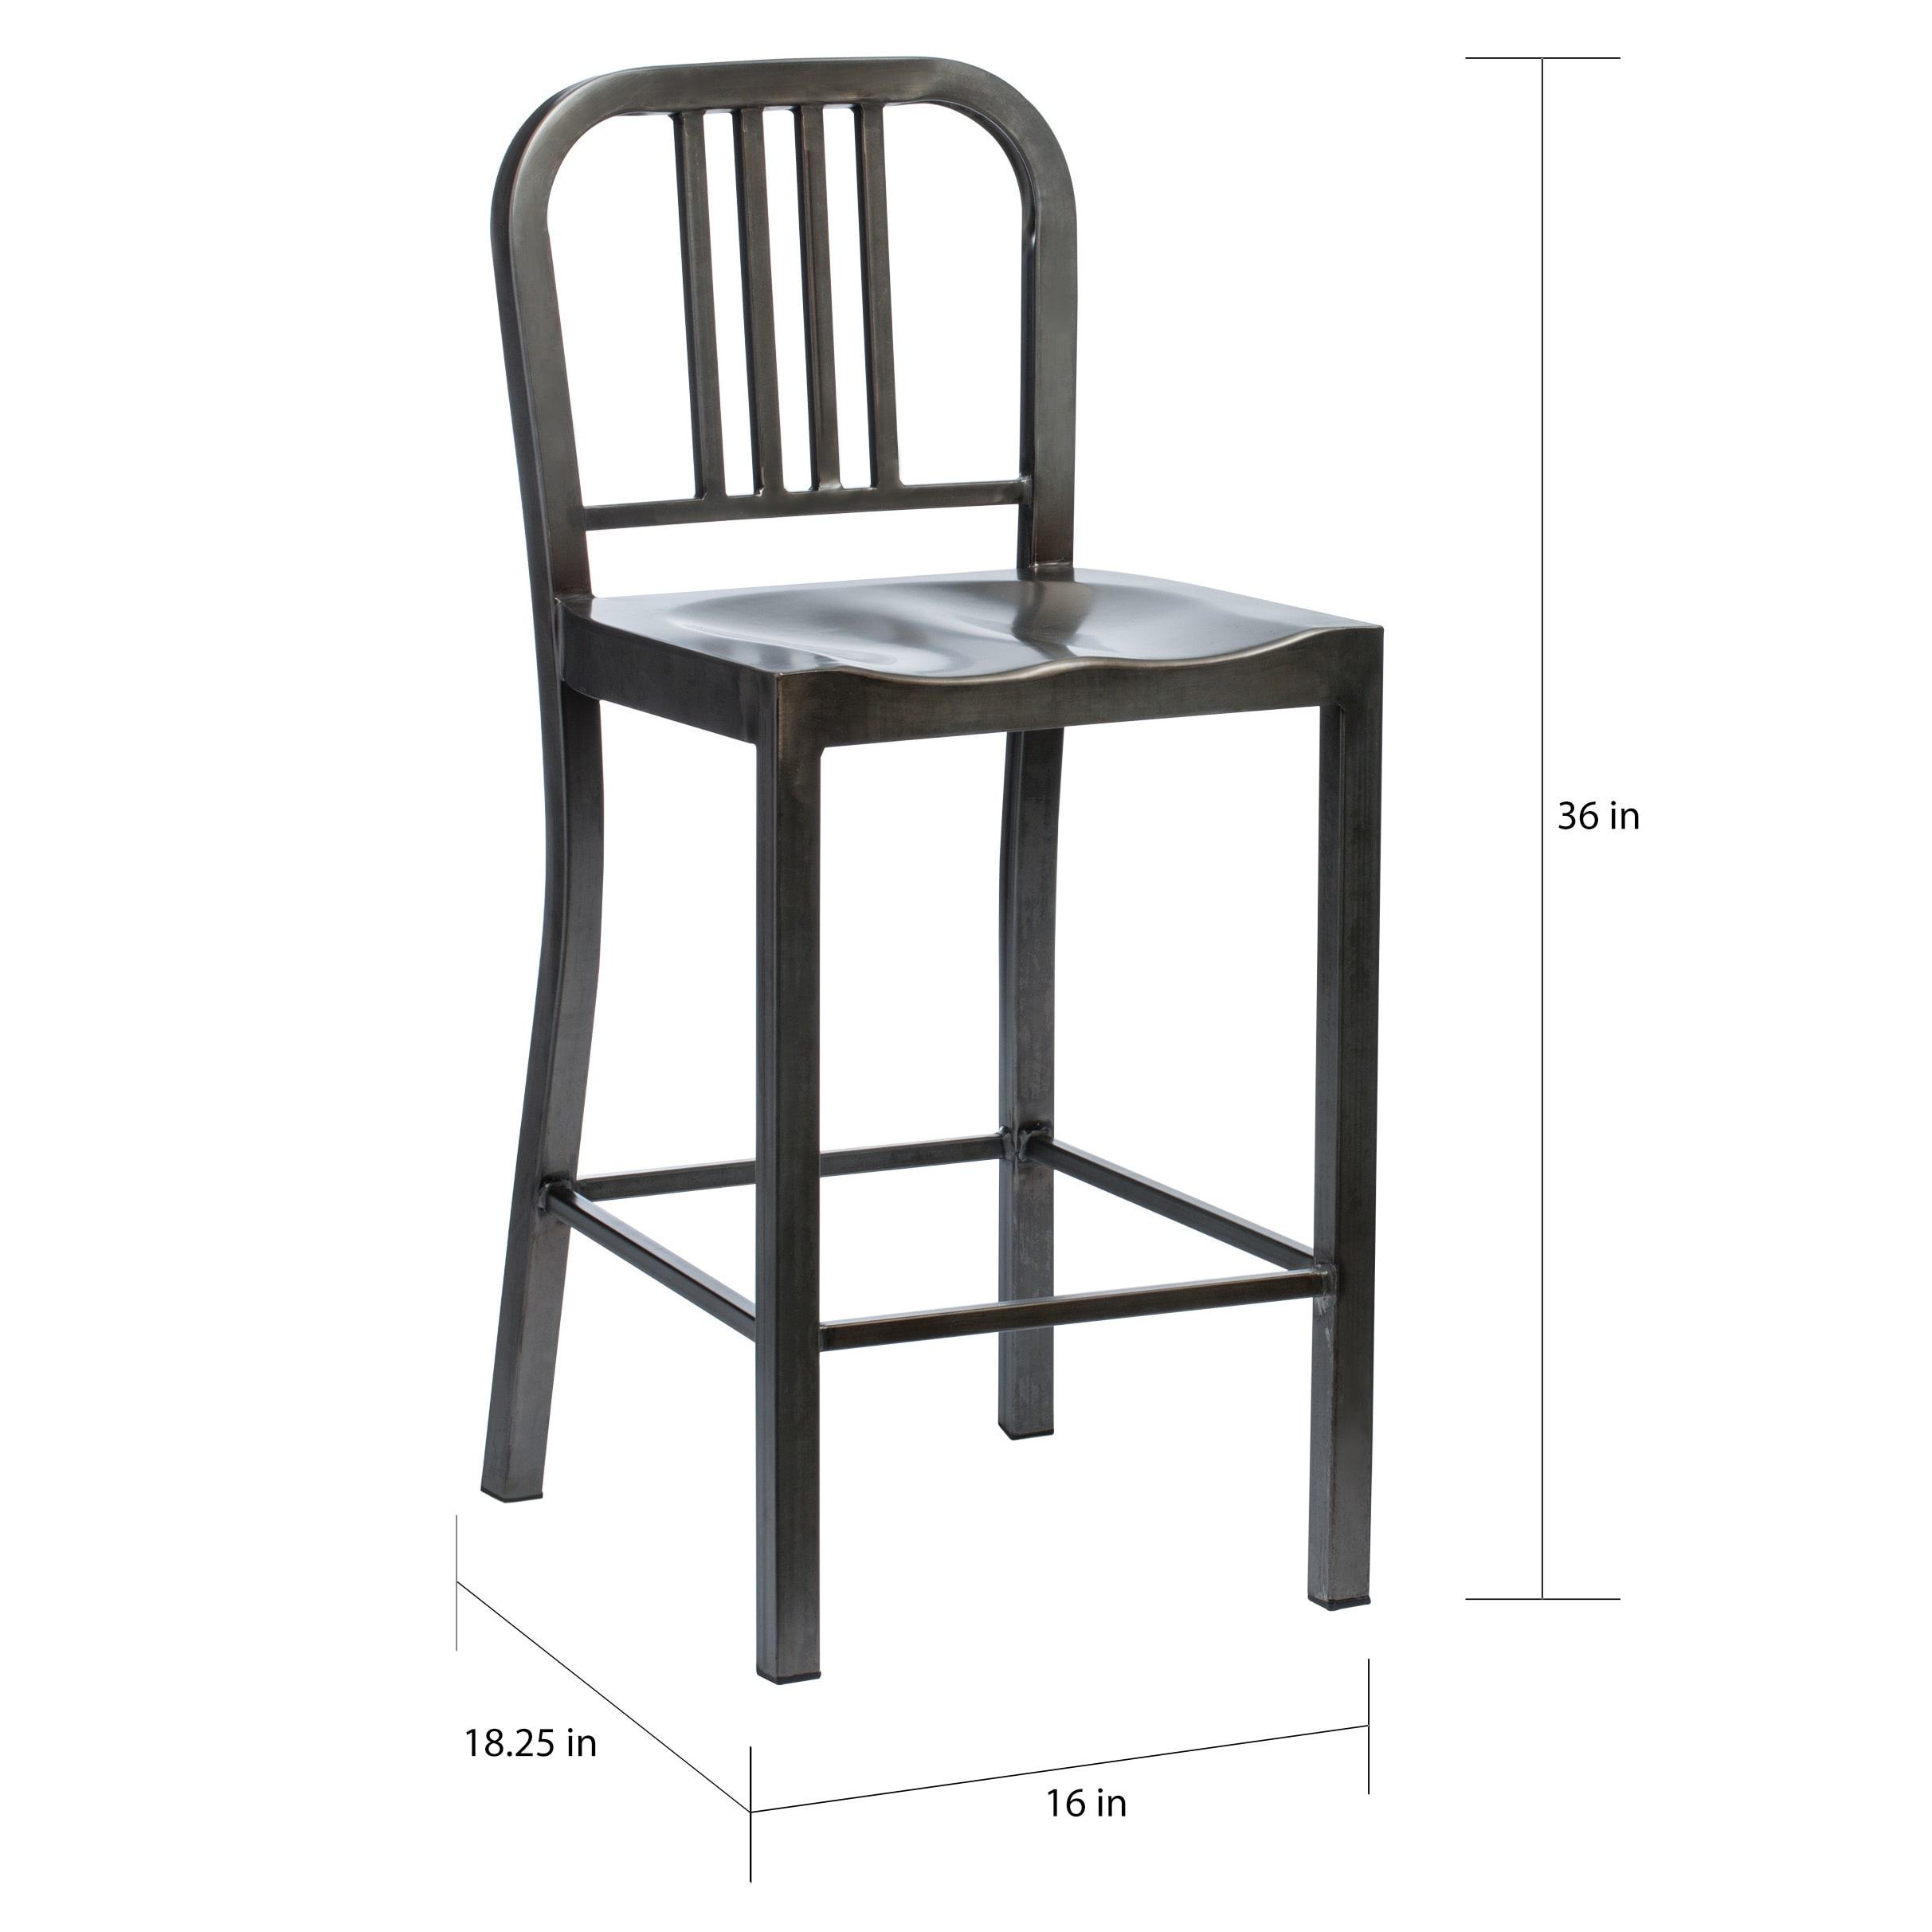 barstool stool stools com back king amazon bar inside elegant with rural stylish pc flash buffalo tools metal regard black furniture crown to